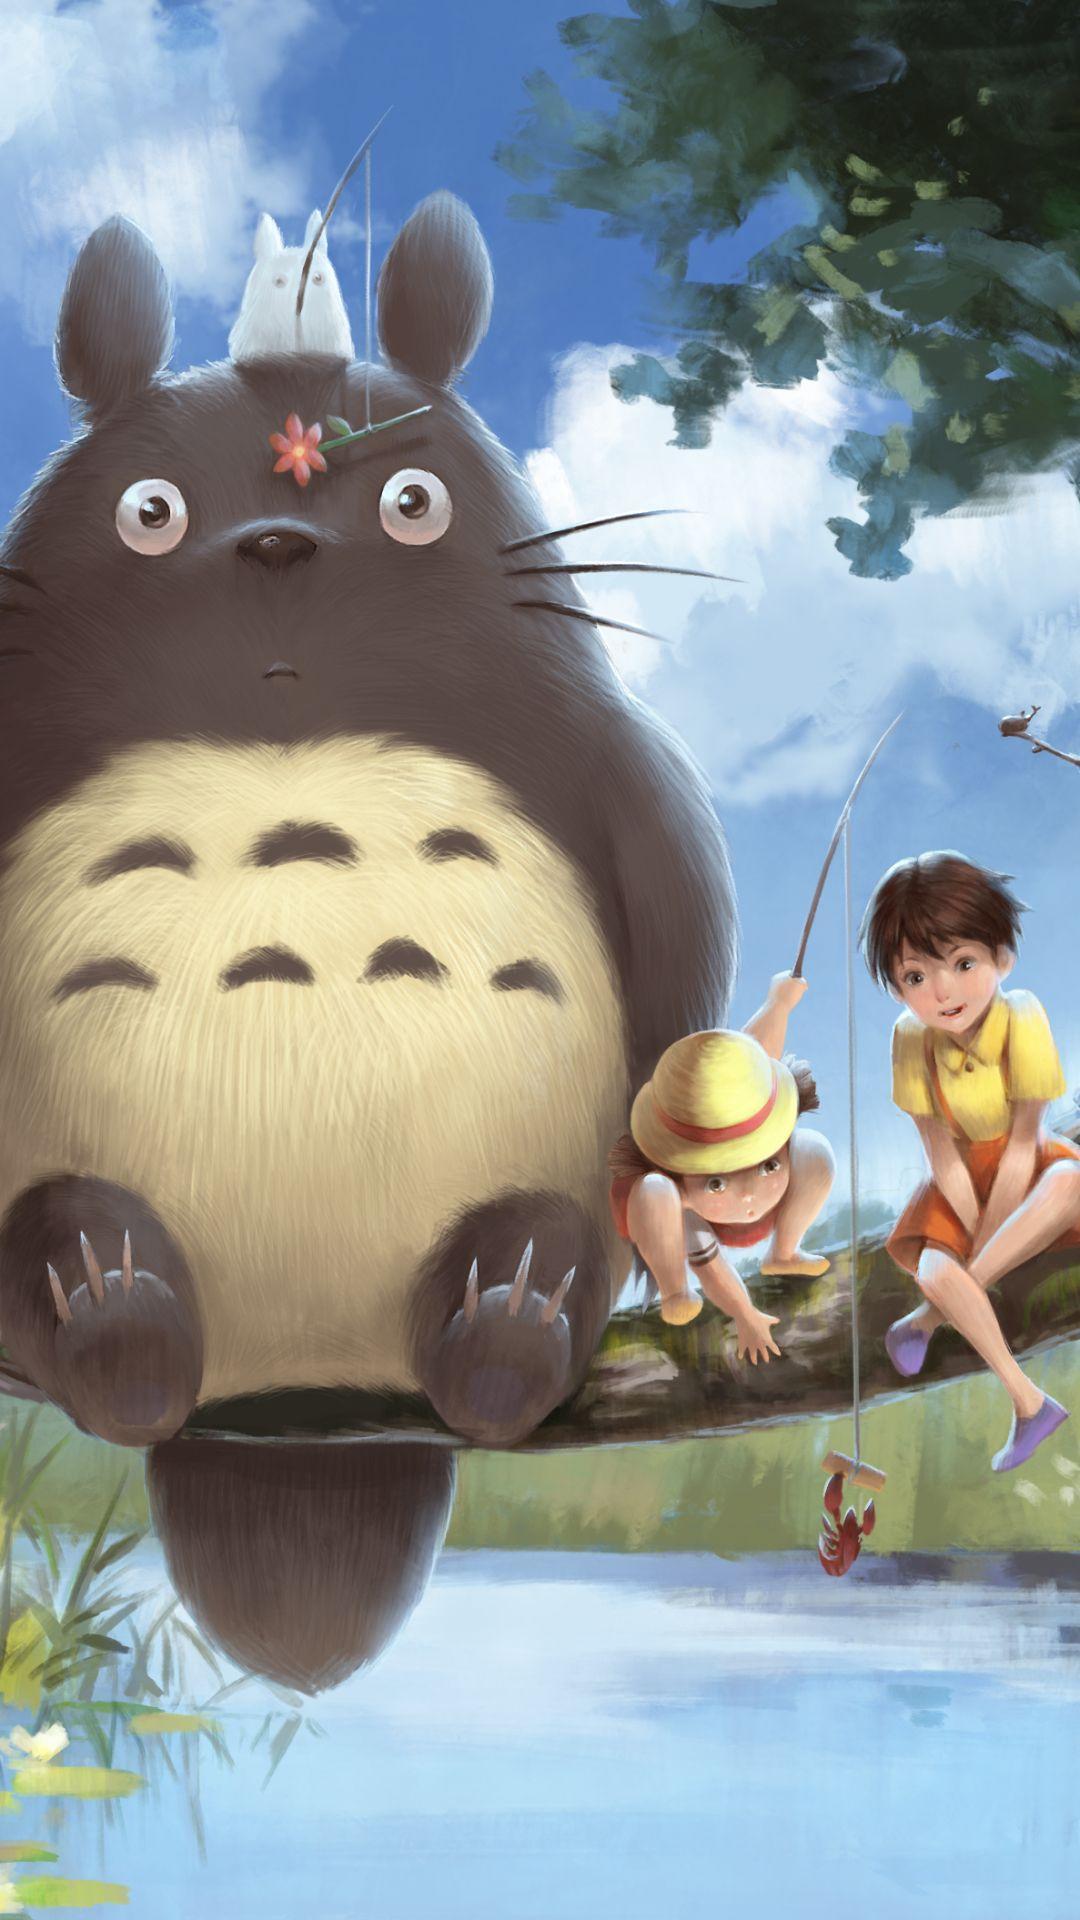 Totoro iphone wallpapers top free totoro iphone - Totoro wallpaper iphone ...